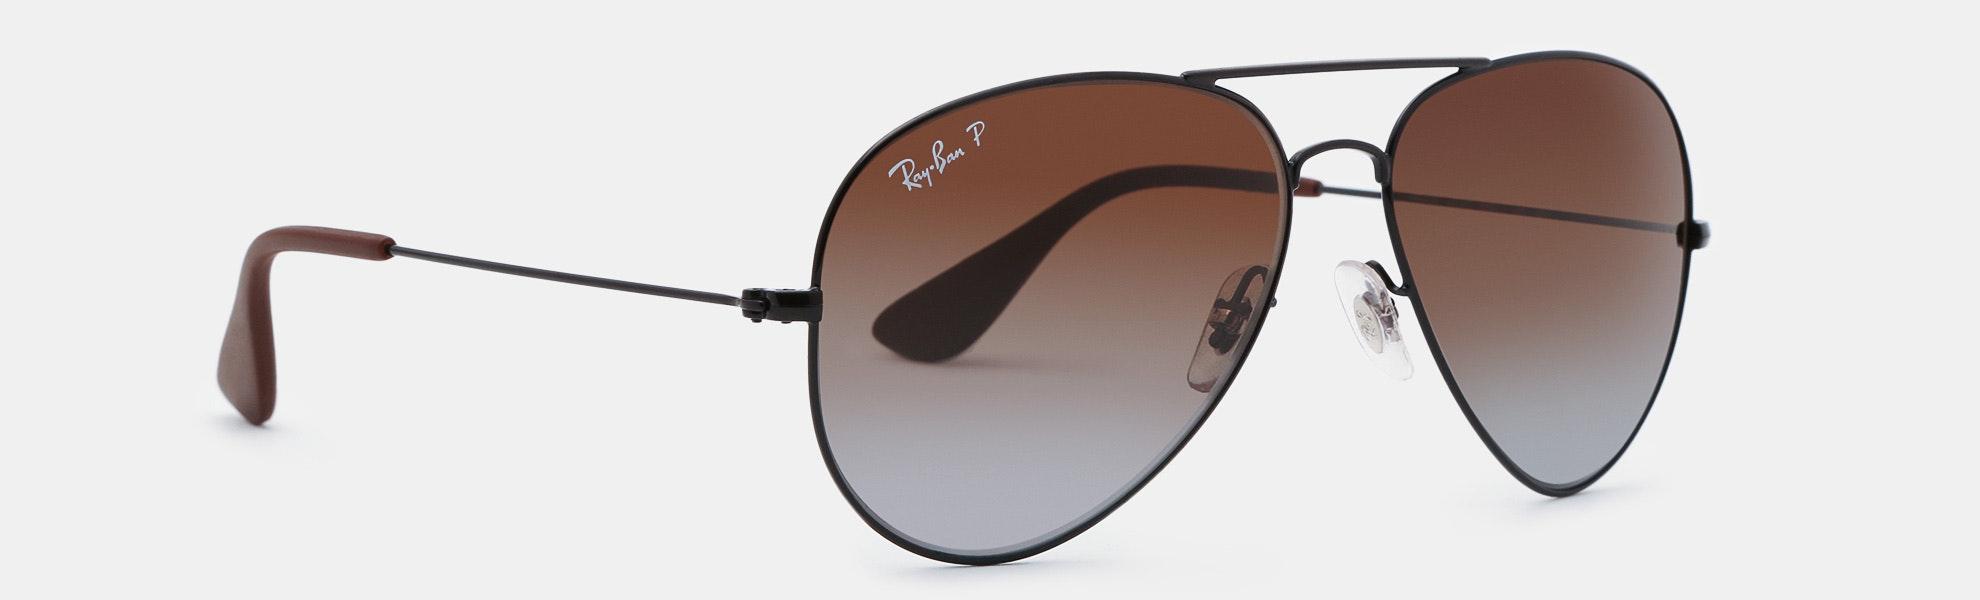 Ray-Ban RB3558 Polarized Aviator Sunglasses